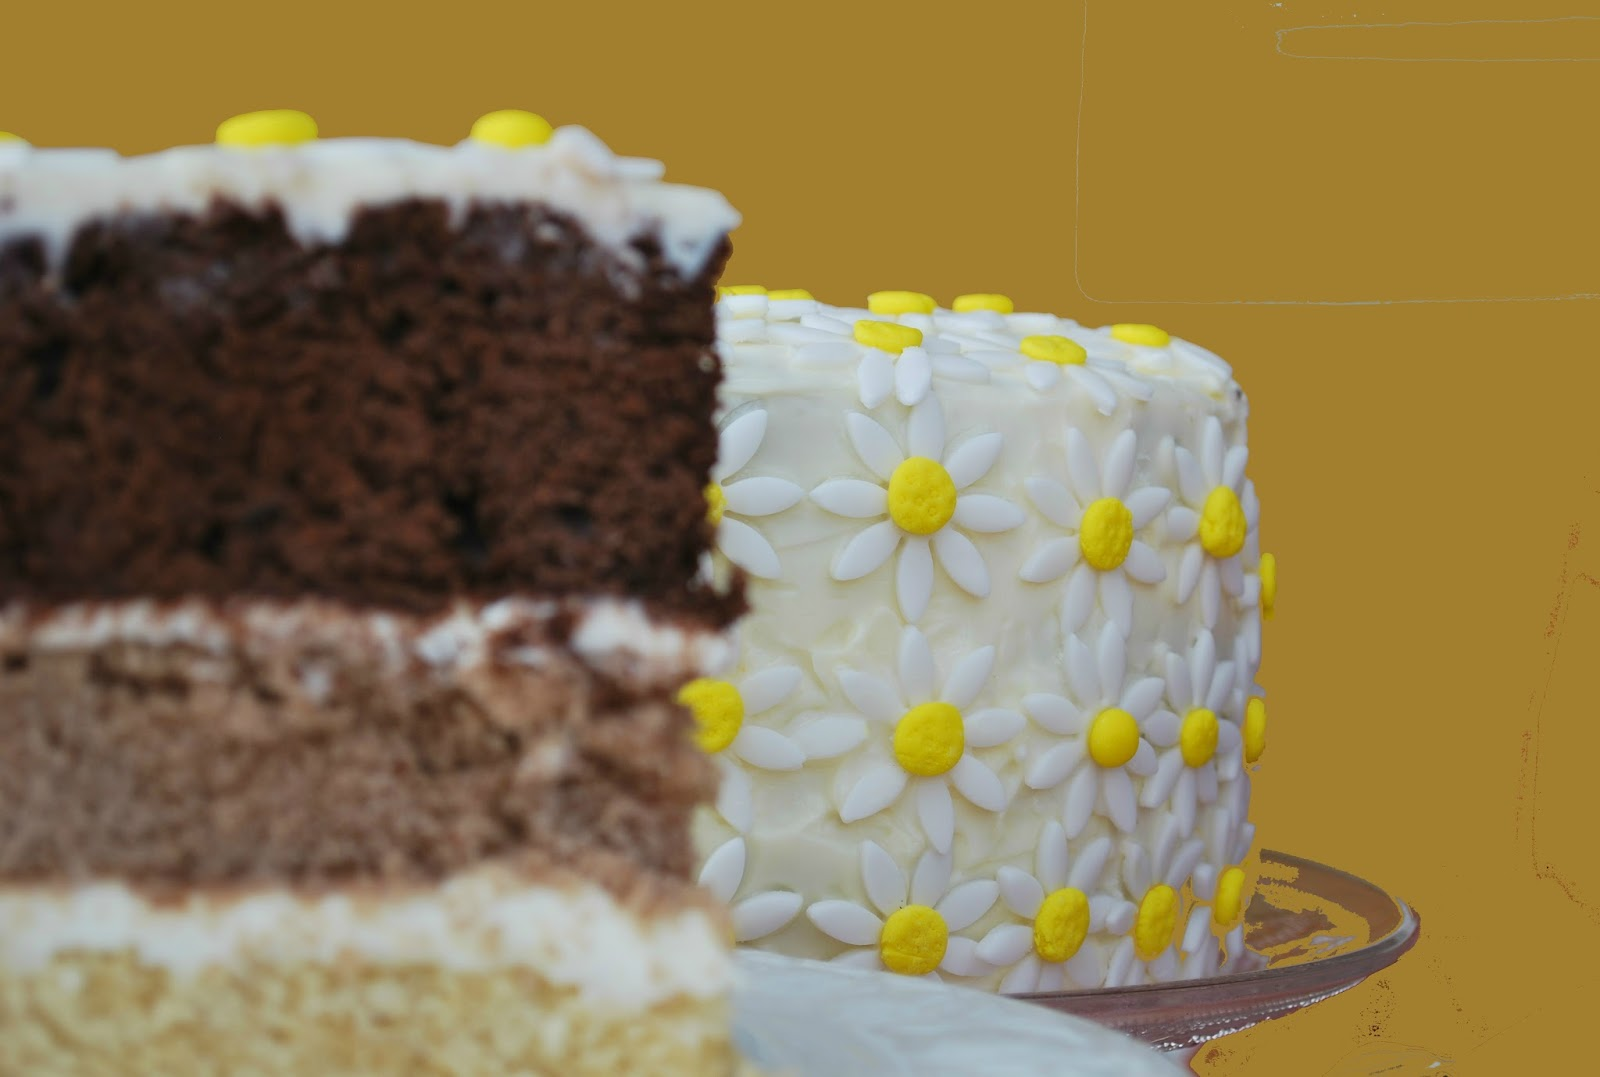 daisy-ombre-cake, margaritas-de-fondant, layer-cake-chocolate